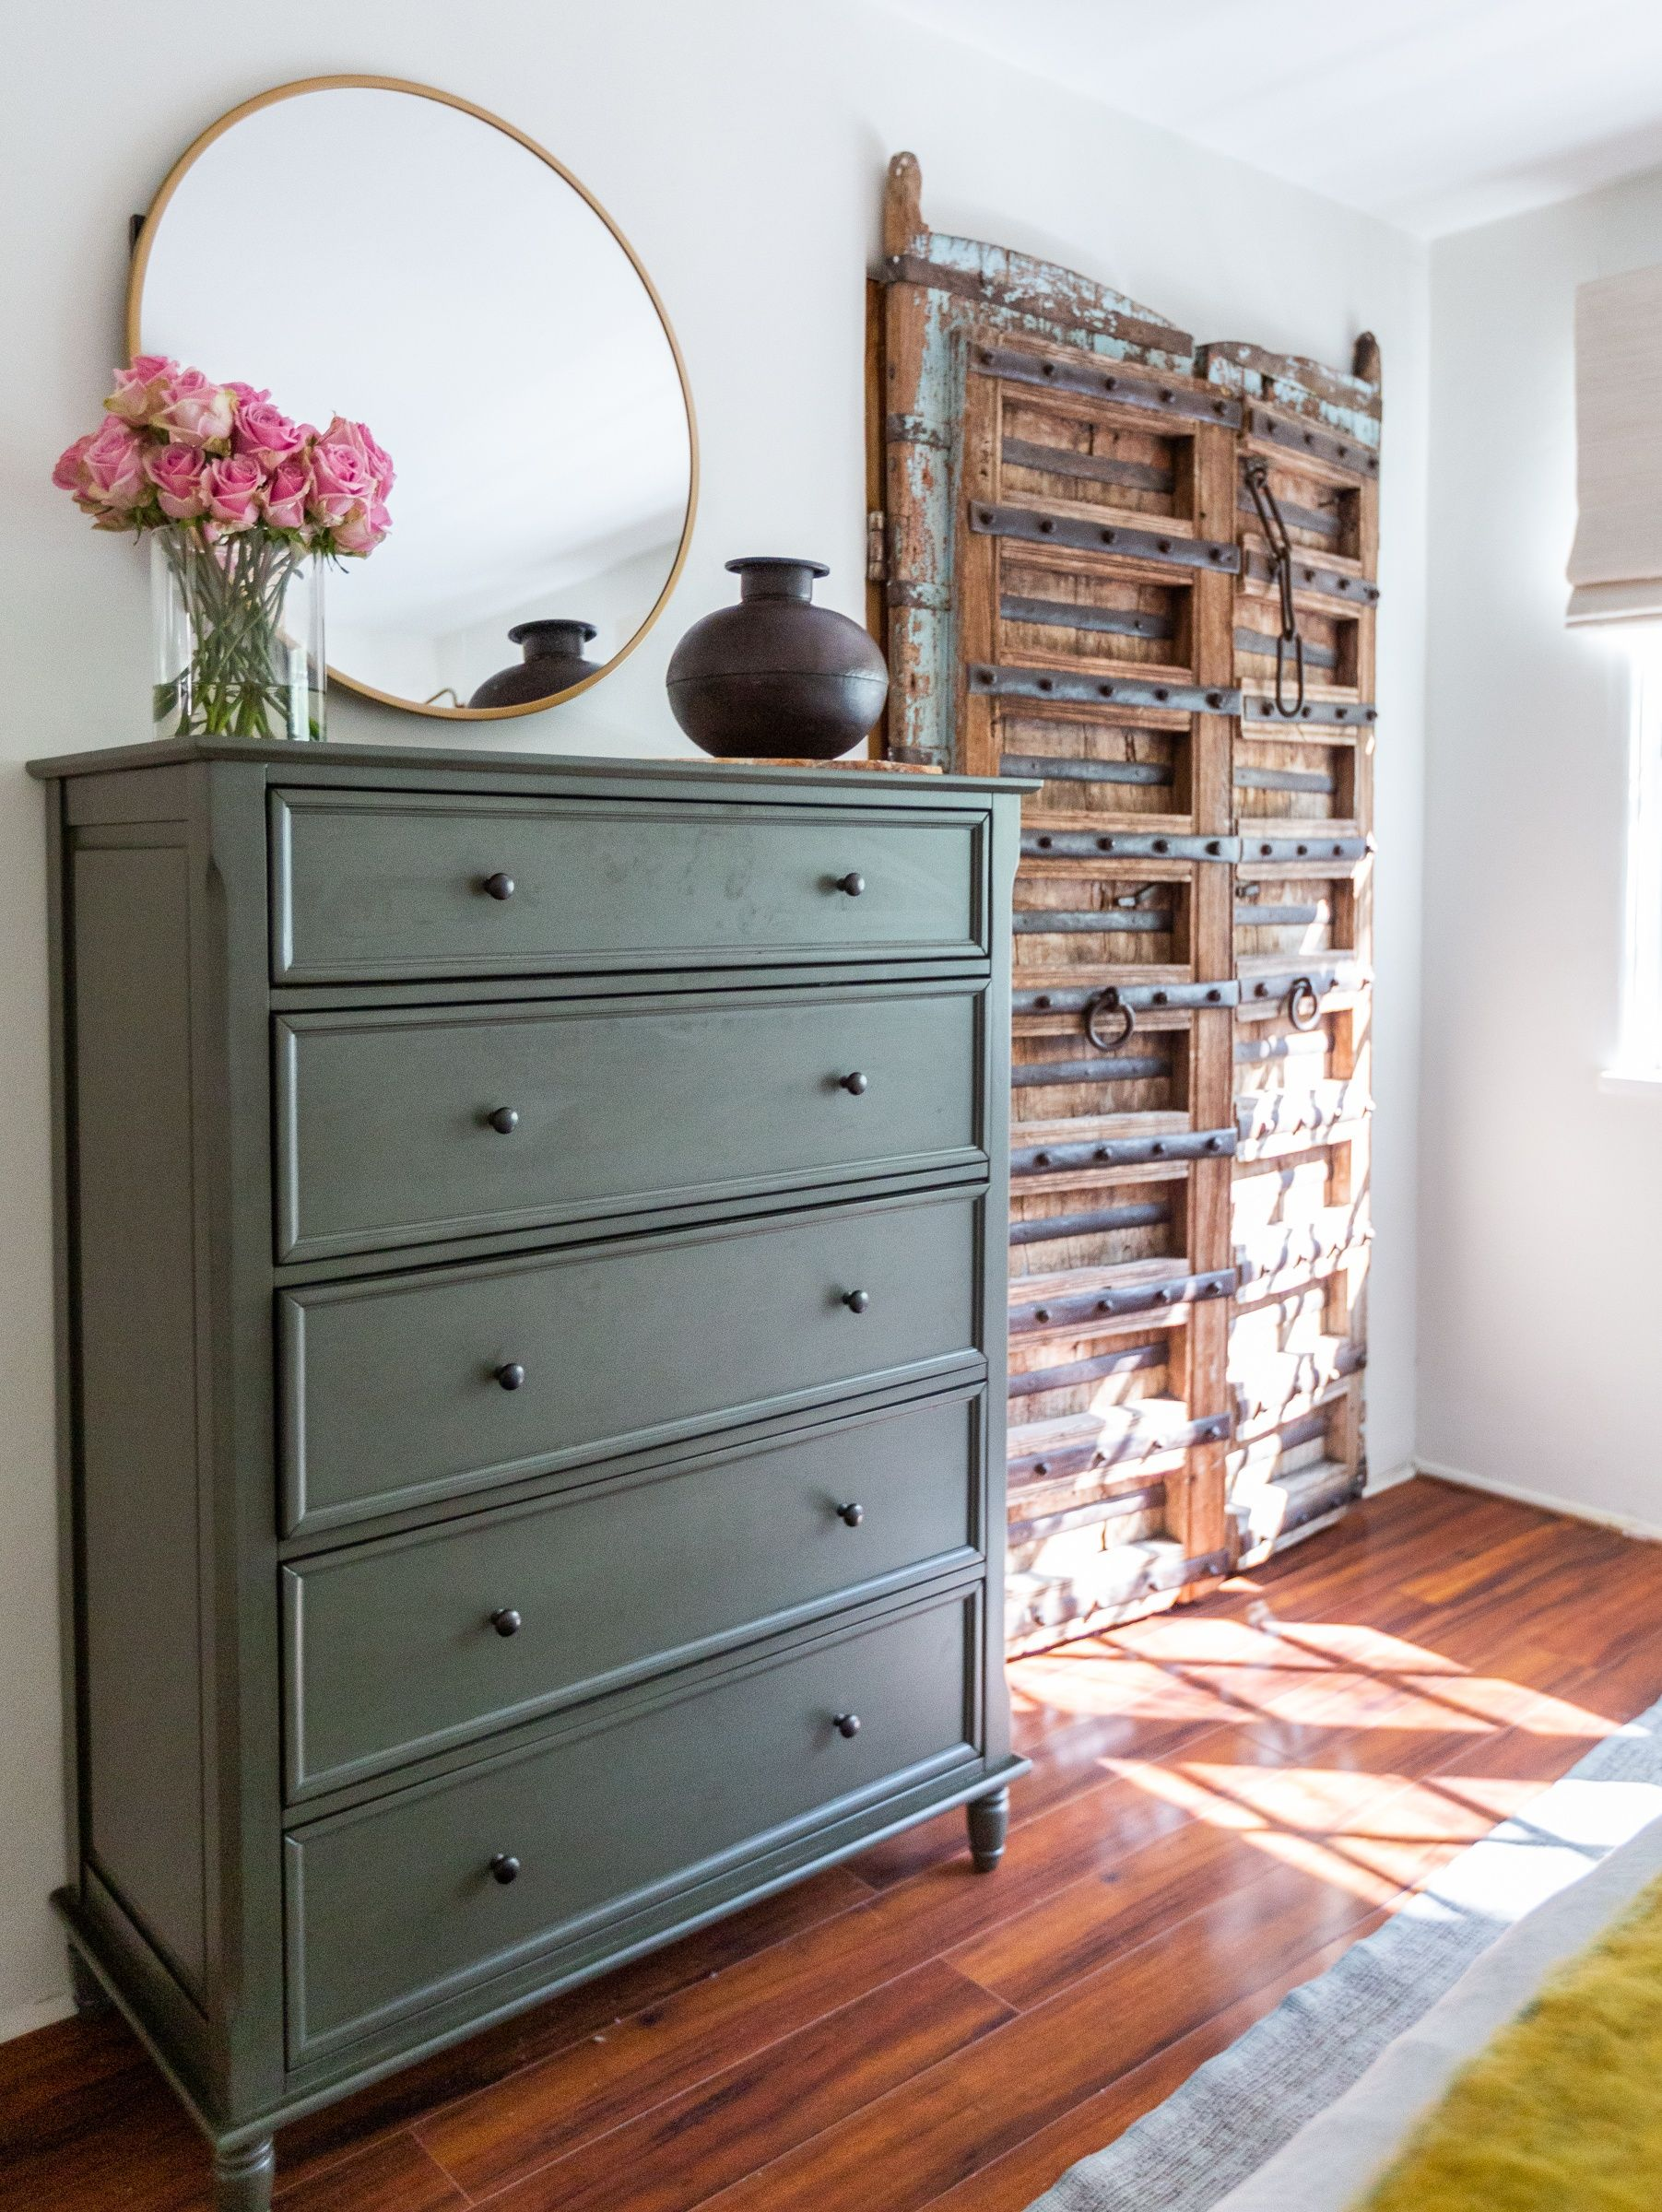 Becca Tobin Los Angeles Home Tour Photos Dresser Decor Tall Dresser Decor Shabby Chic Furniture [ 2400 x 1803 Pixel ]